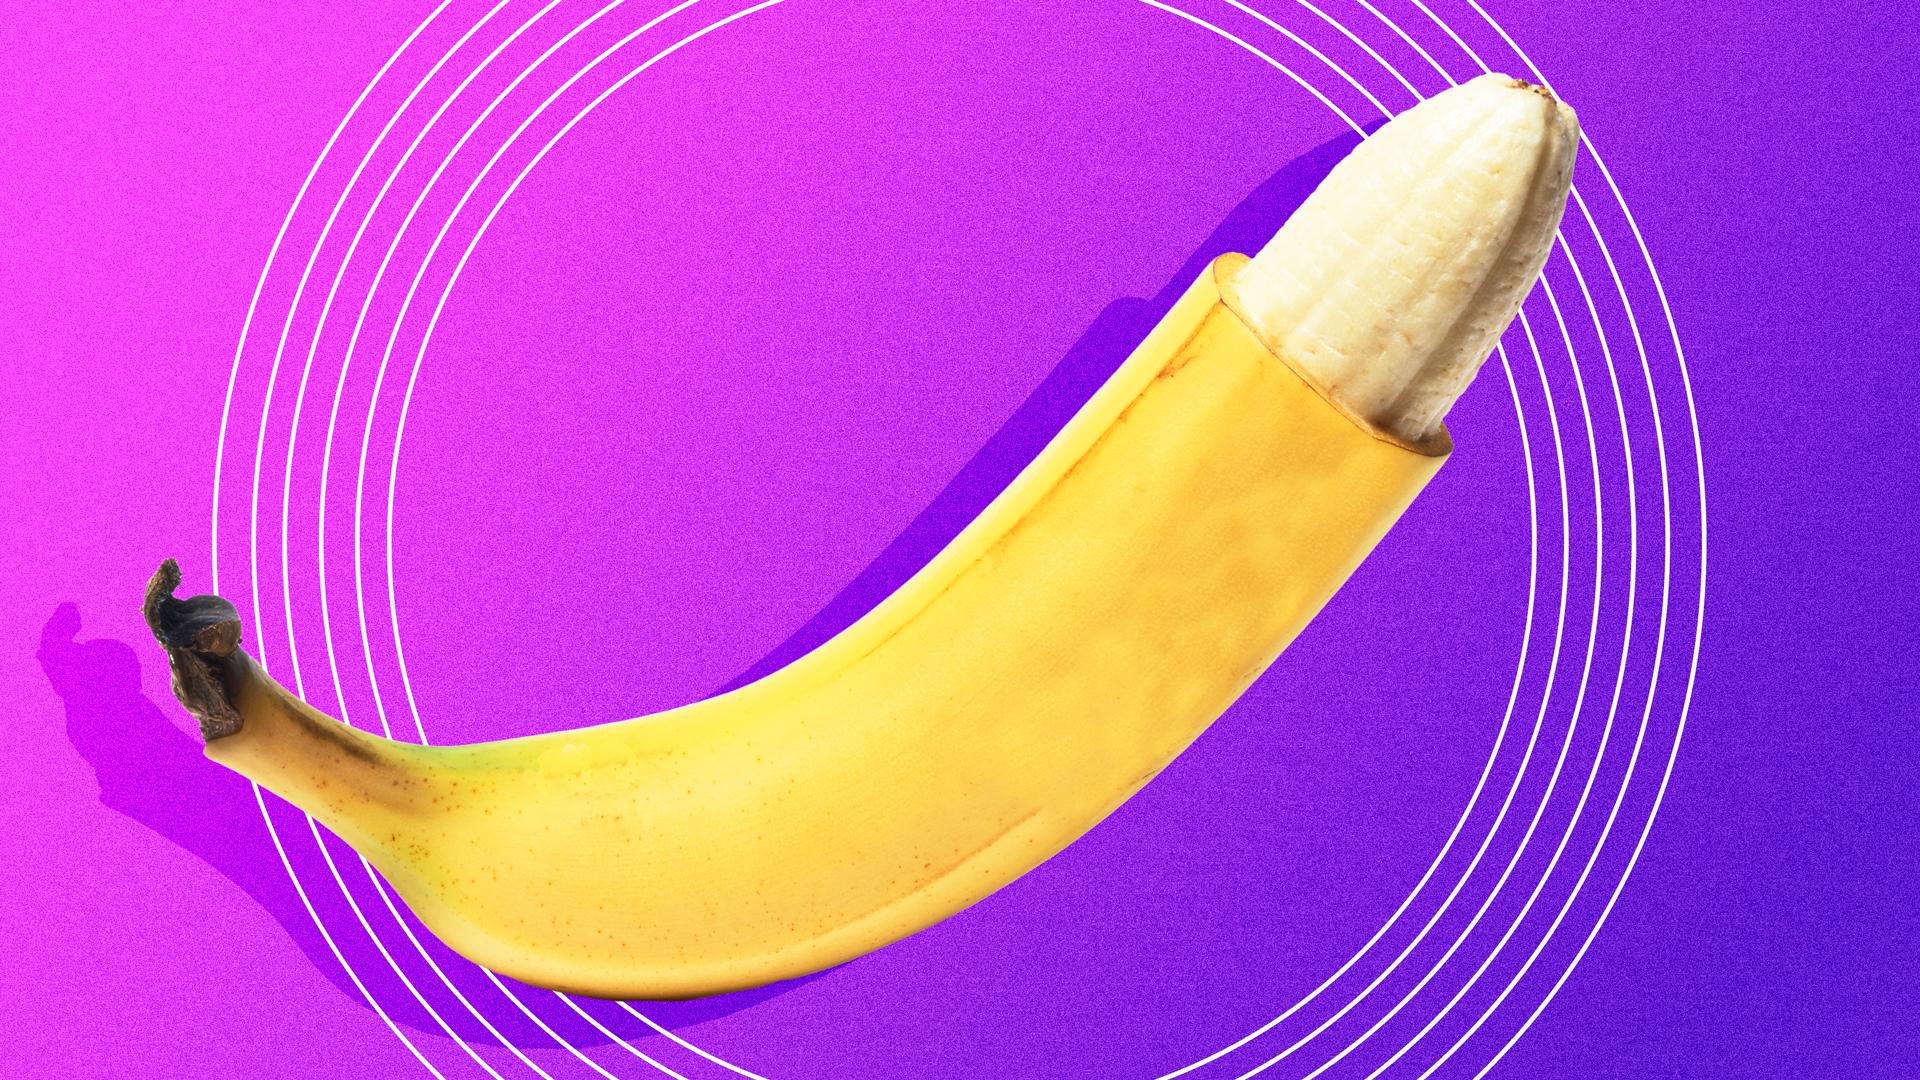 The Anti-Circumcision Movement Is Gaining Momentum — Should Parents Care?